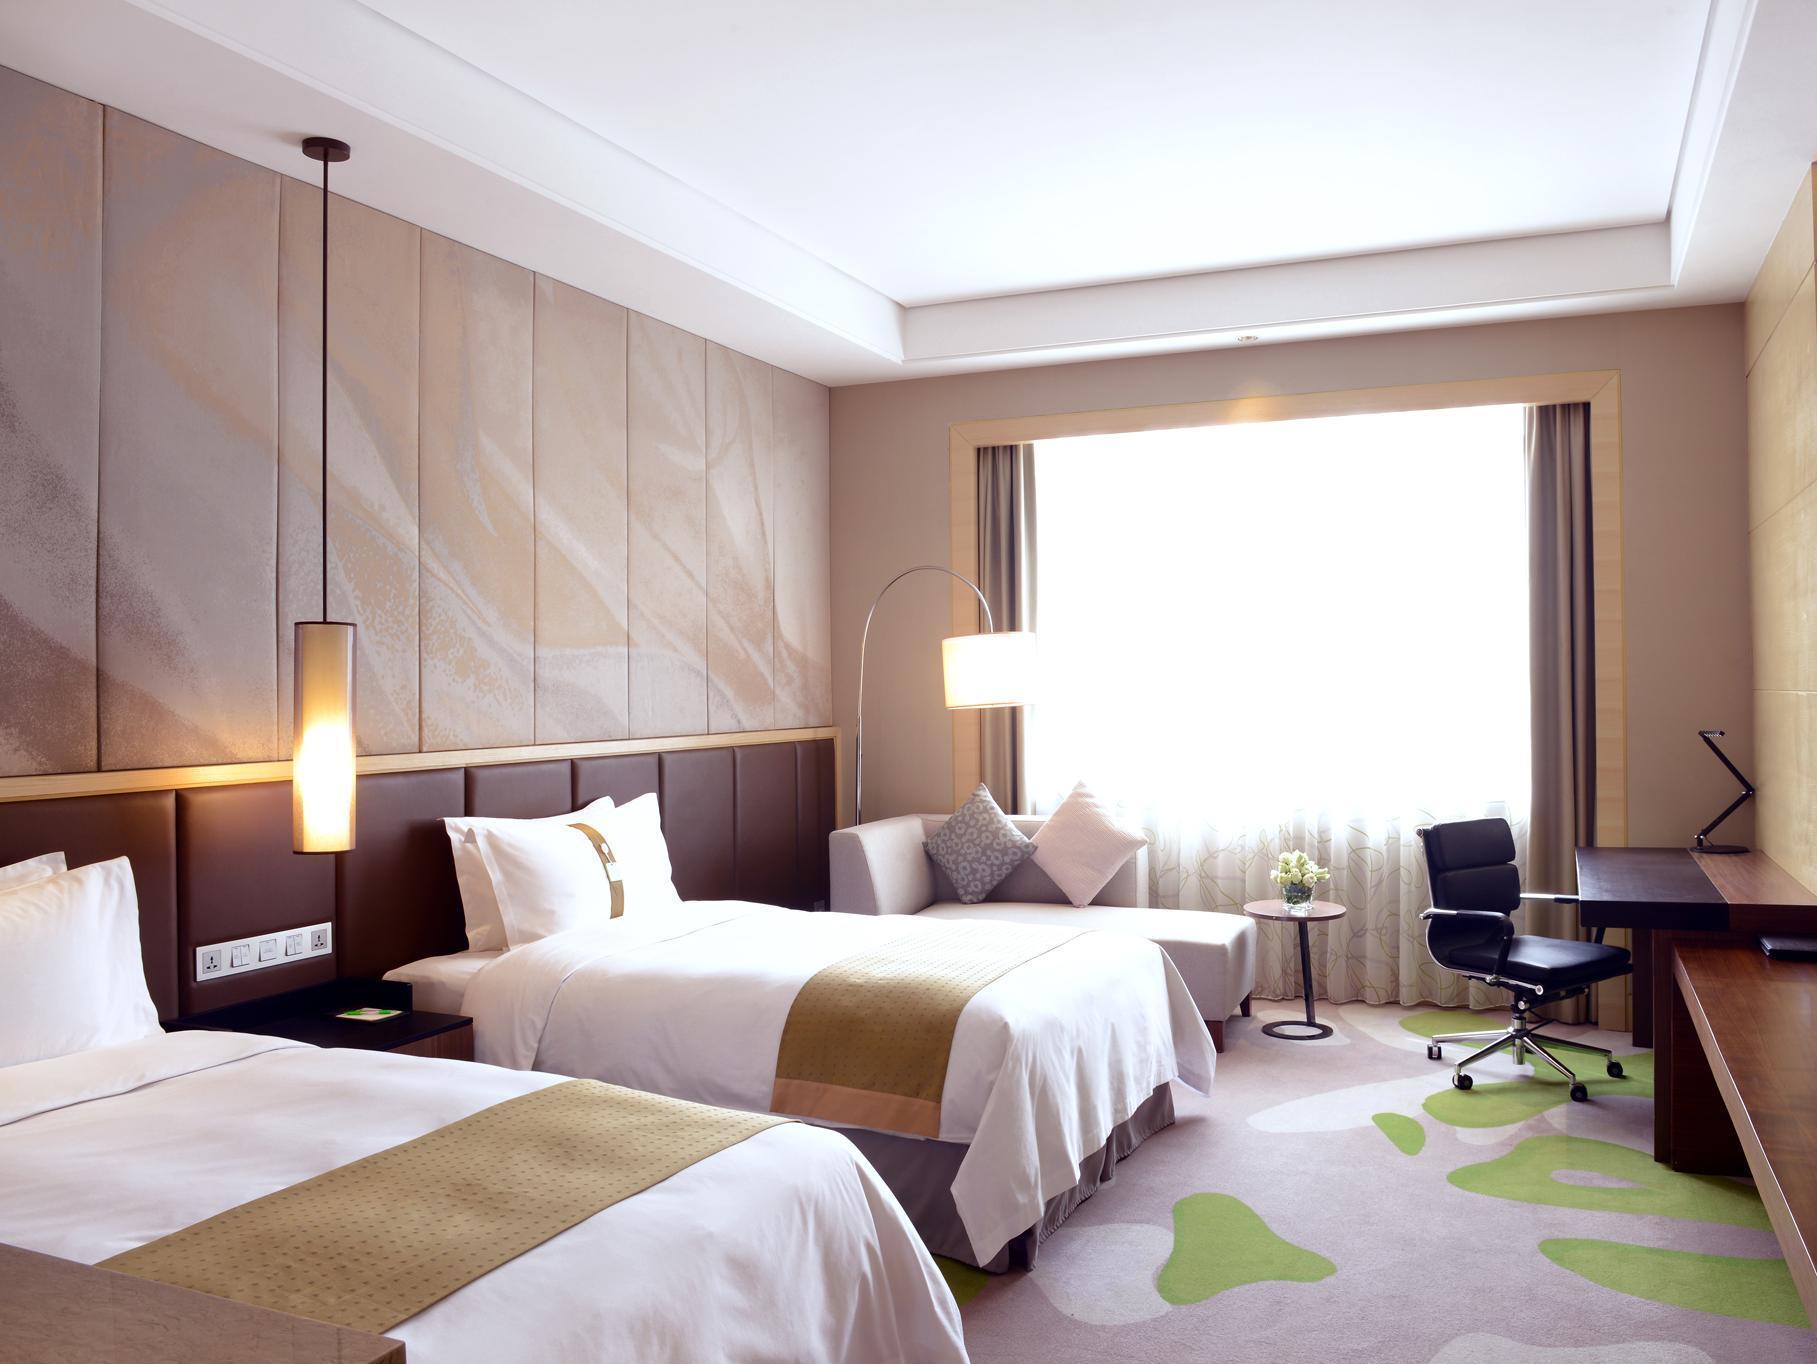 Holiday Inn Qingdao Expo, Qingdao